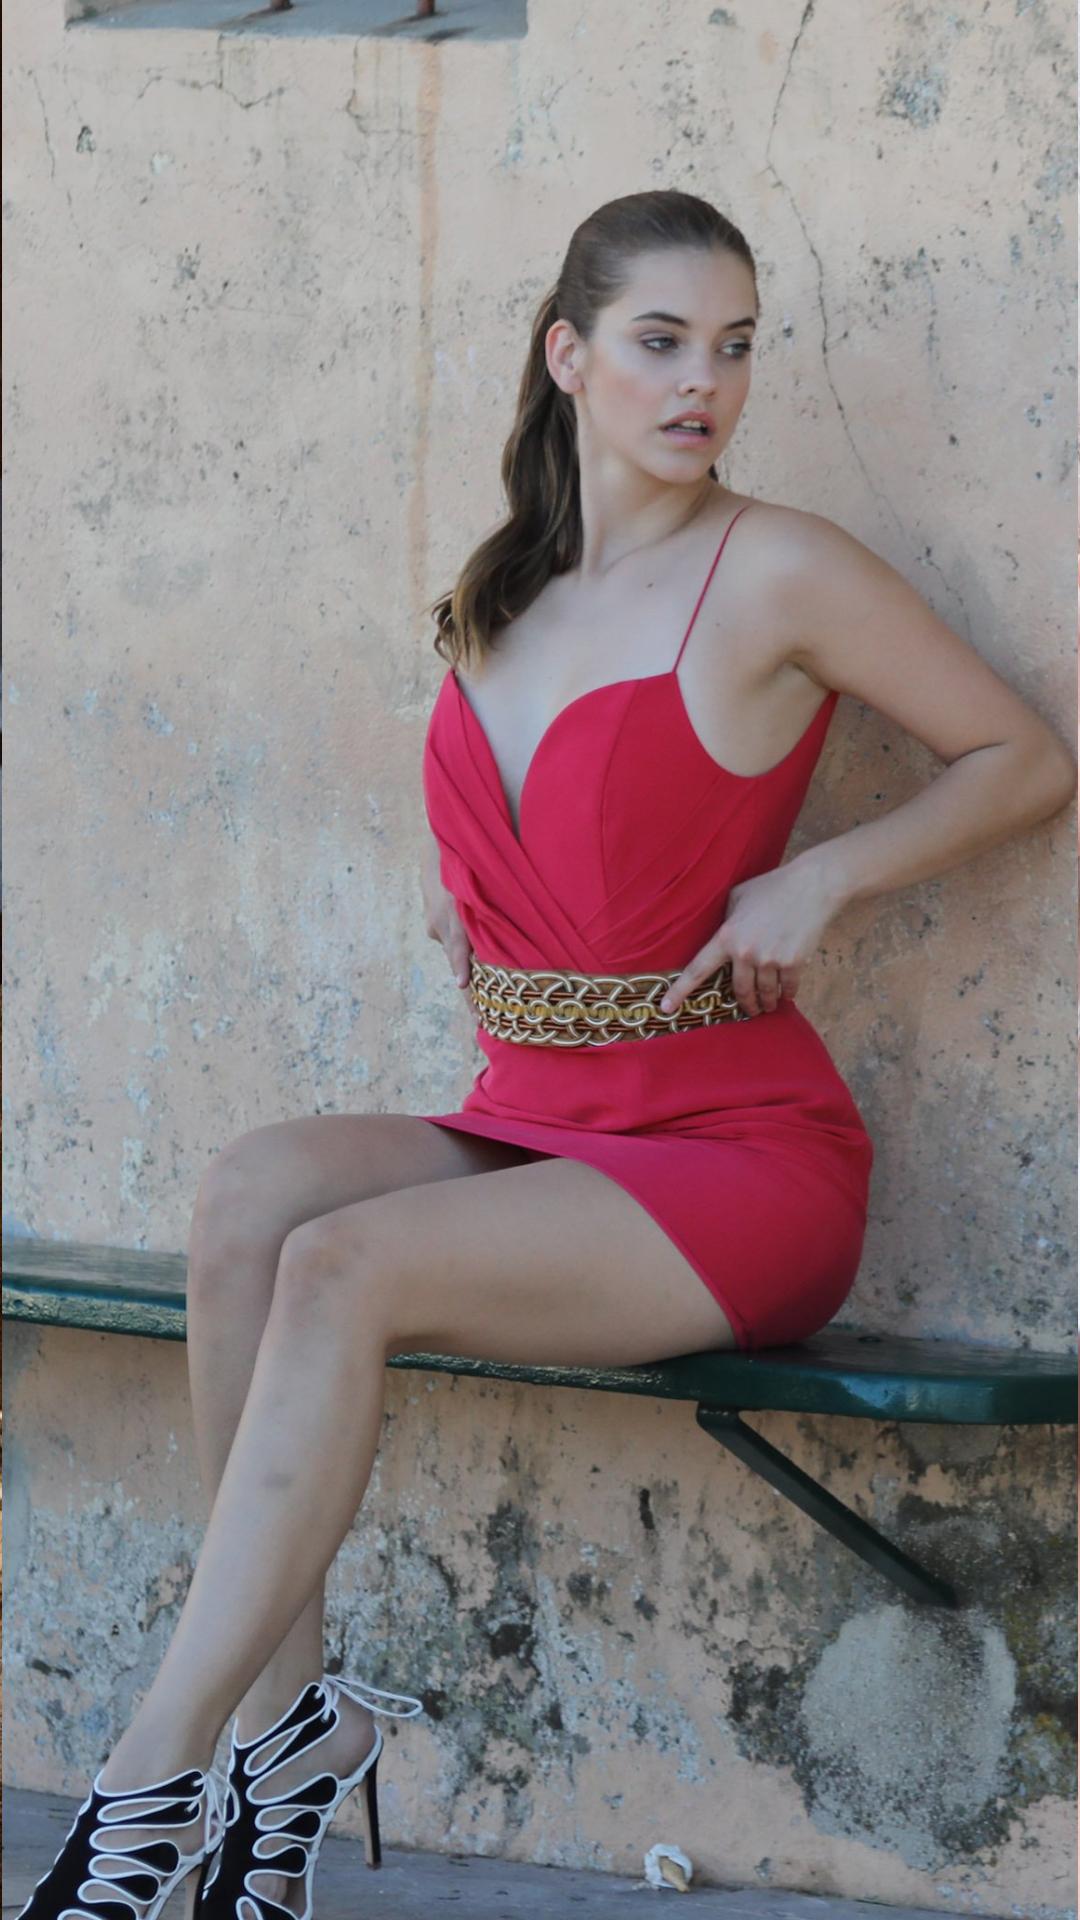 Barbara Palvin Sexy Girl Model Wallpapers Download